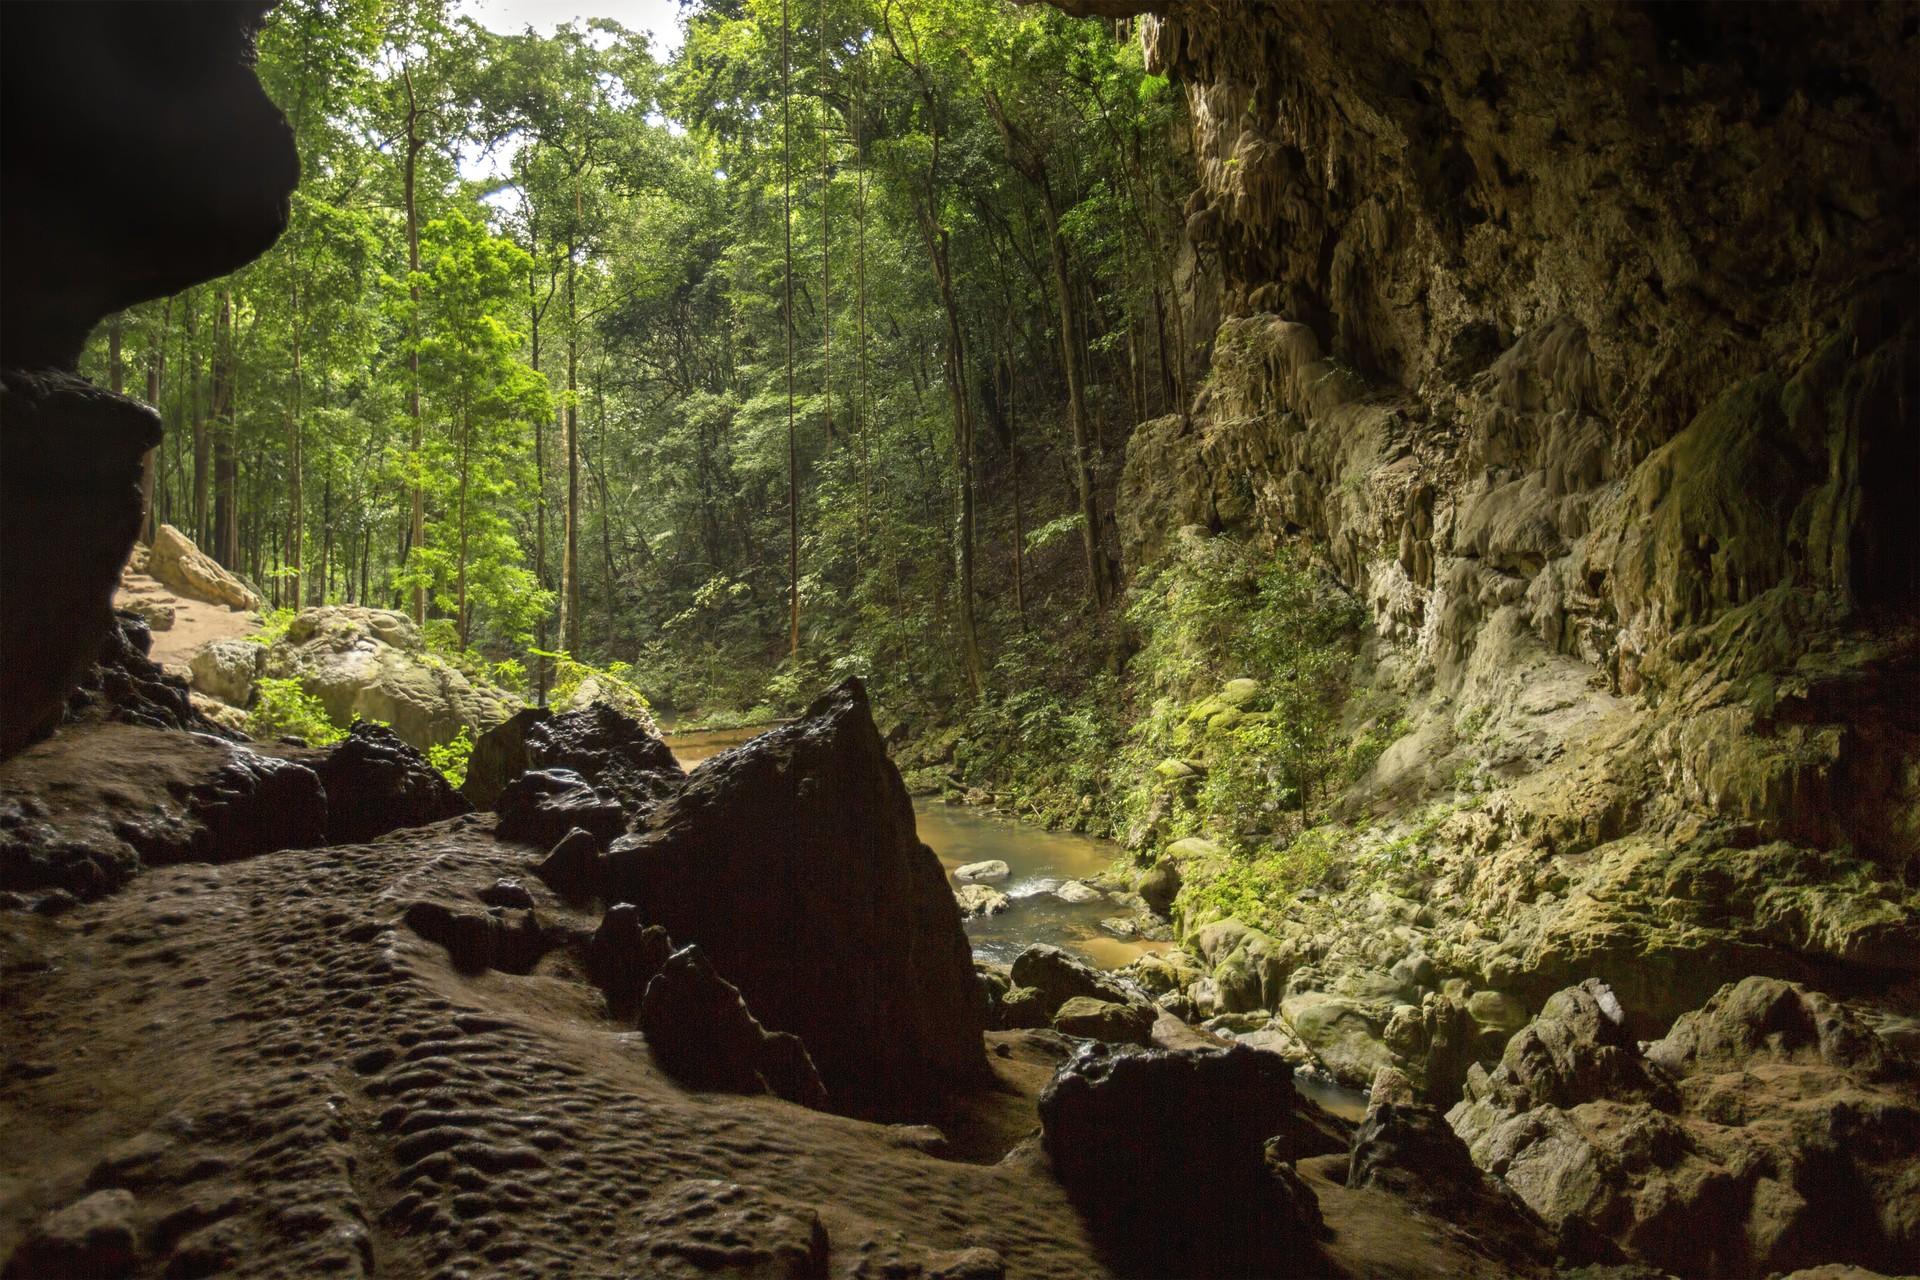 Rio Frio cave in Belize